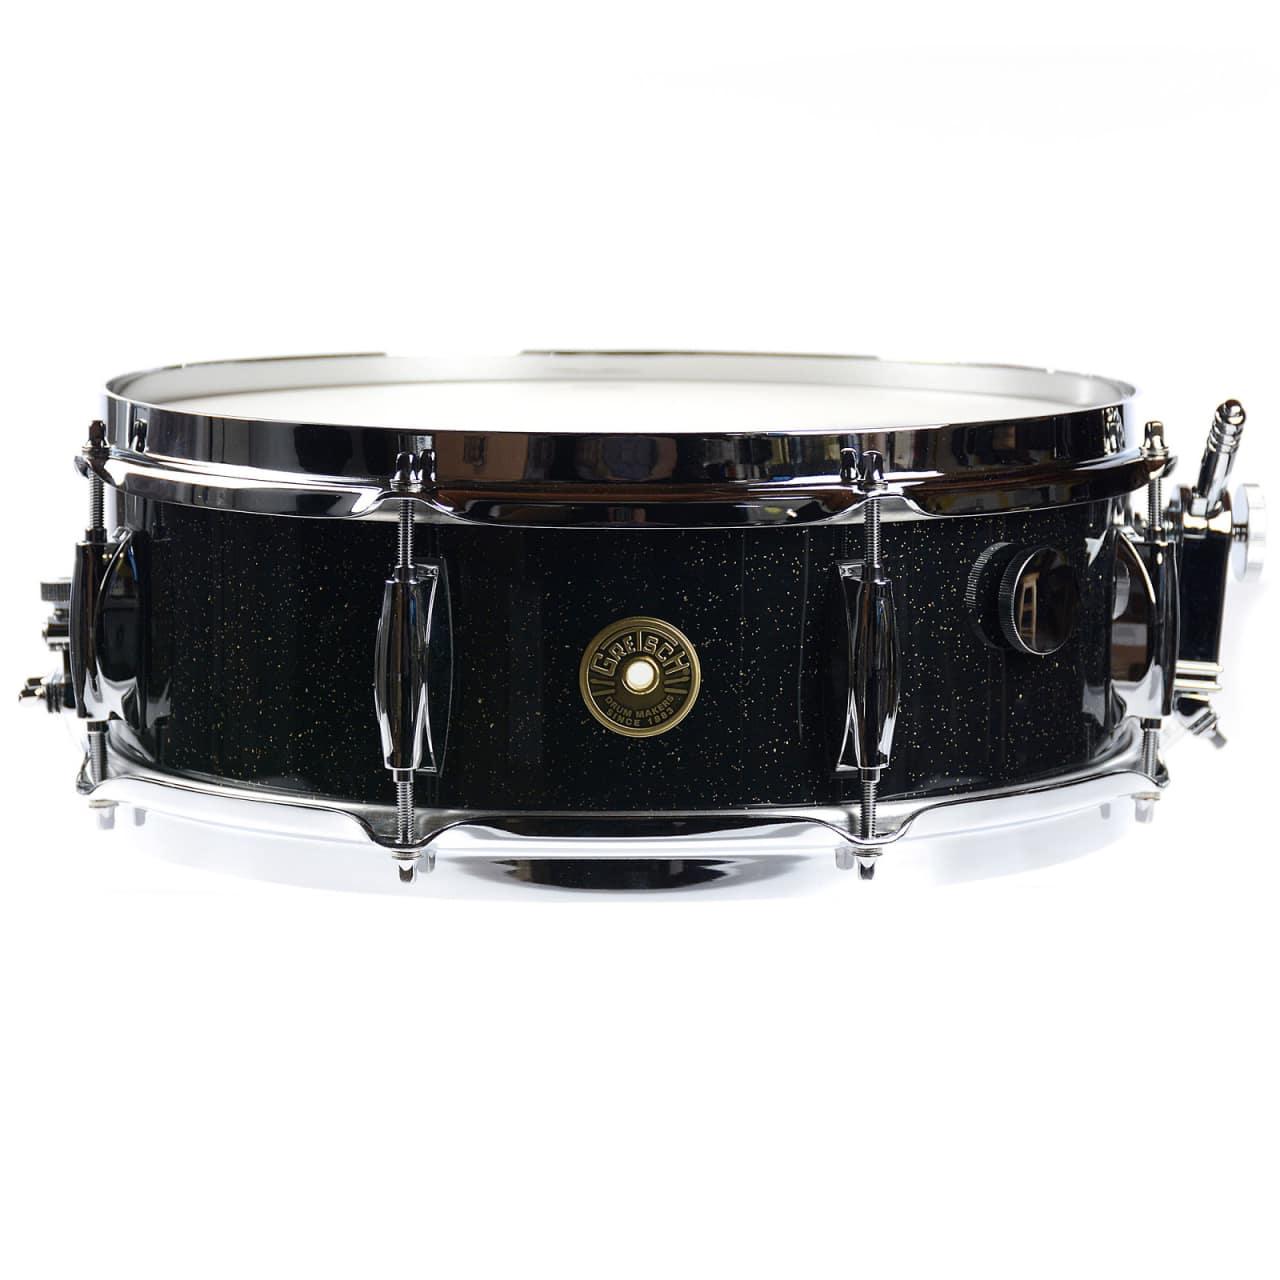 gretsch 5x14 broadkaster snare drum anniversary sparkle reverb. Black Bedroom Furniture Sets. Home Design Ideas